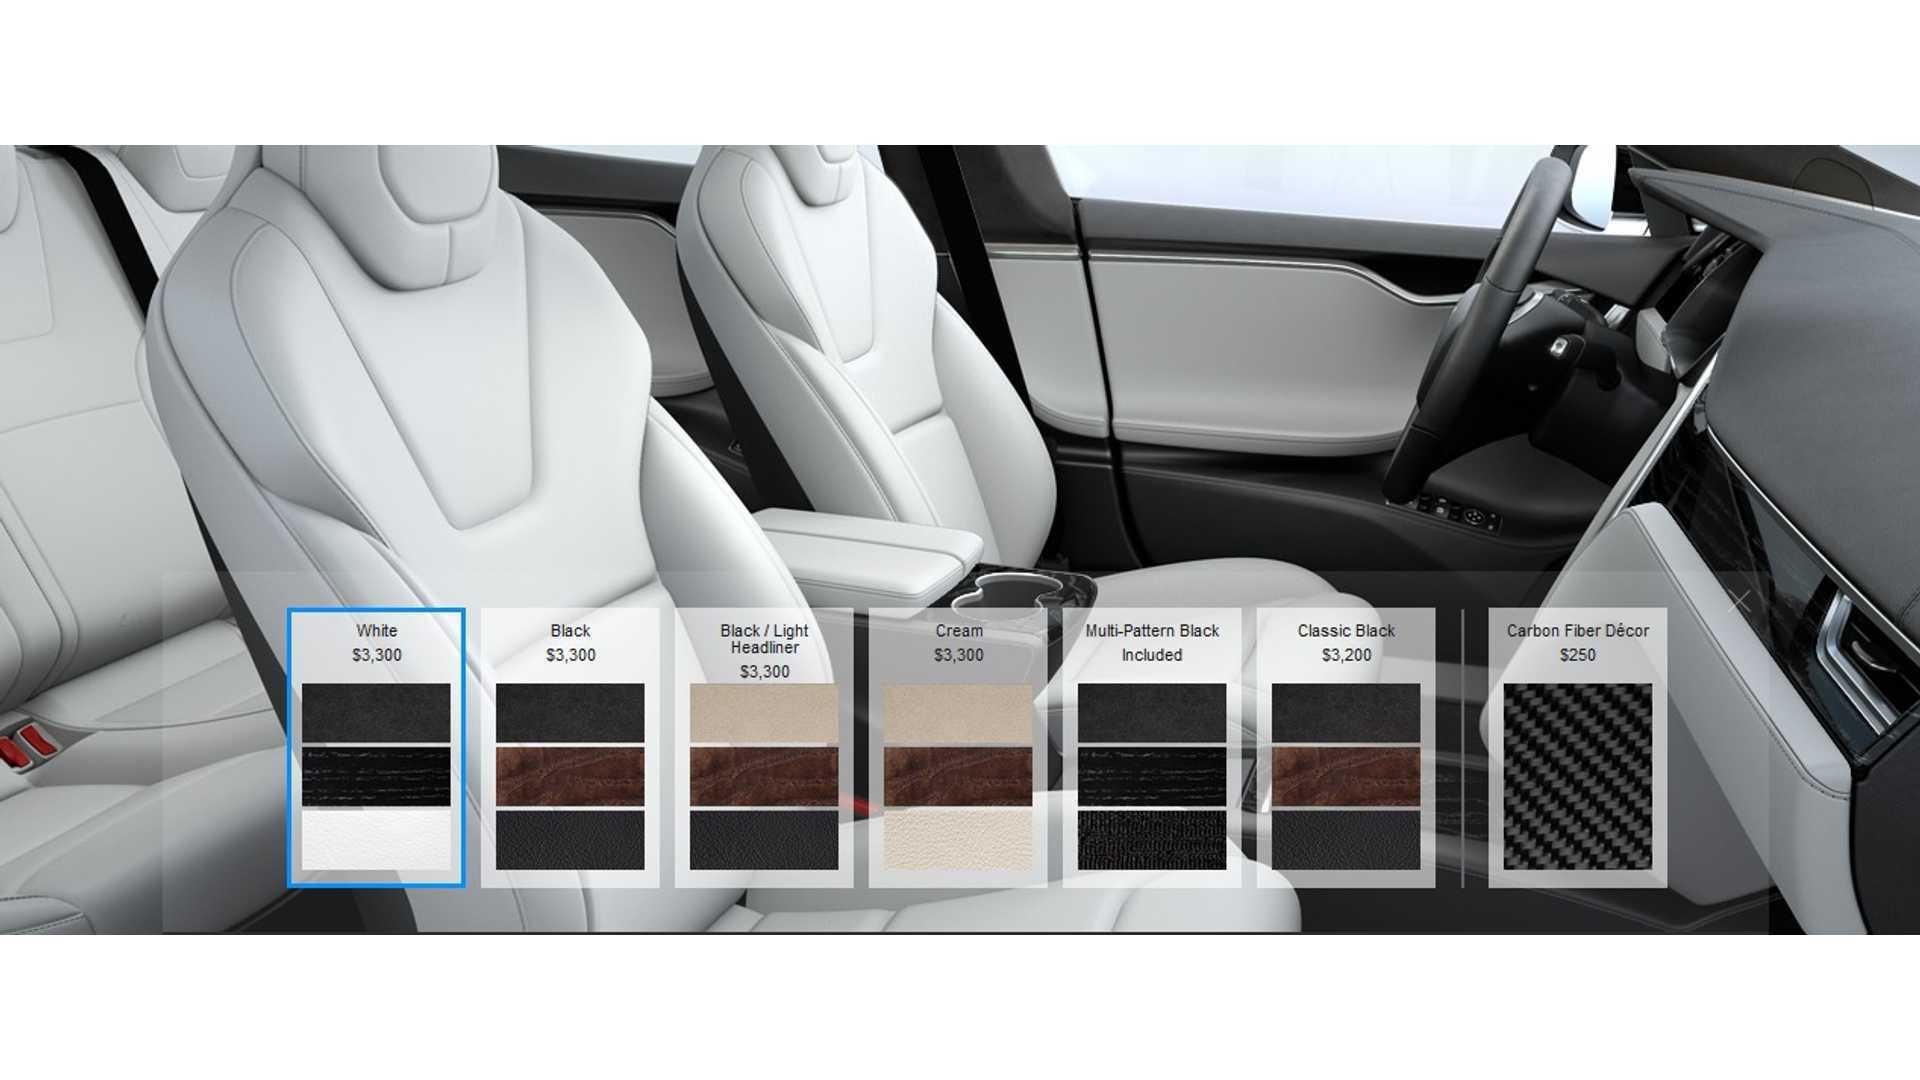 Tesla Eliminates Leather Seating Options On Model S And Model X